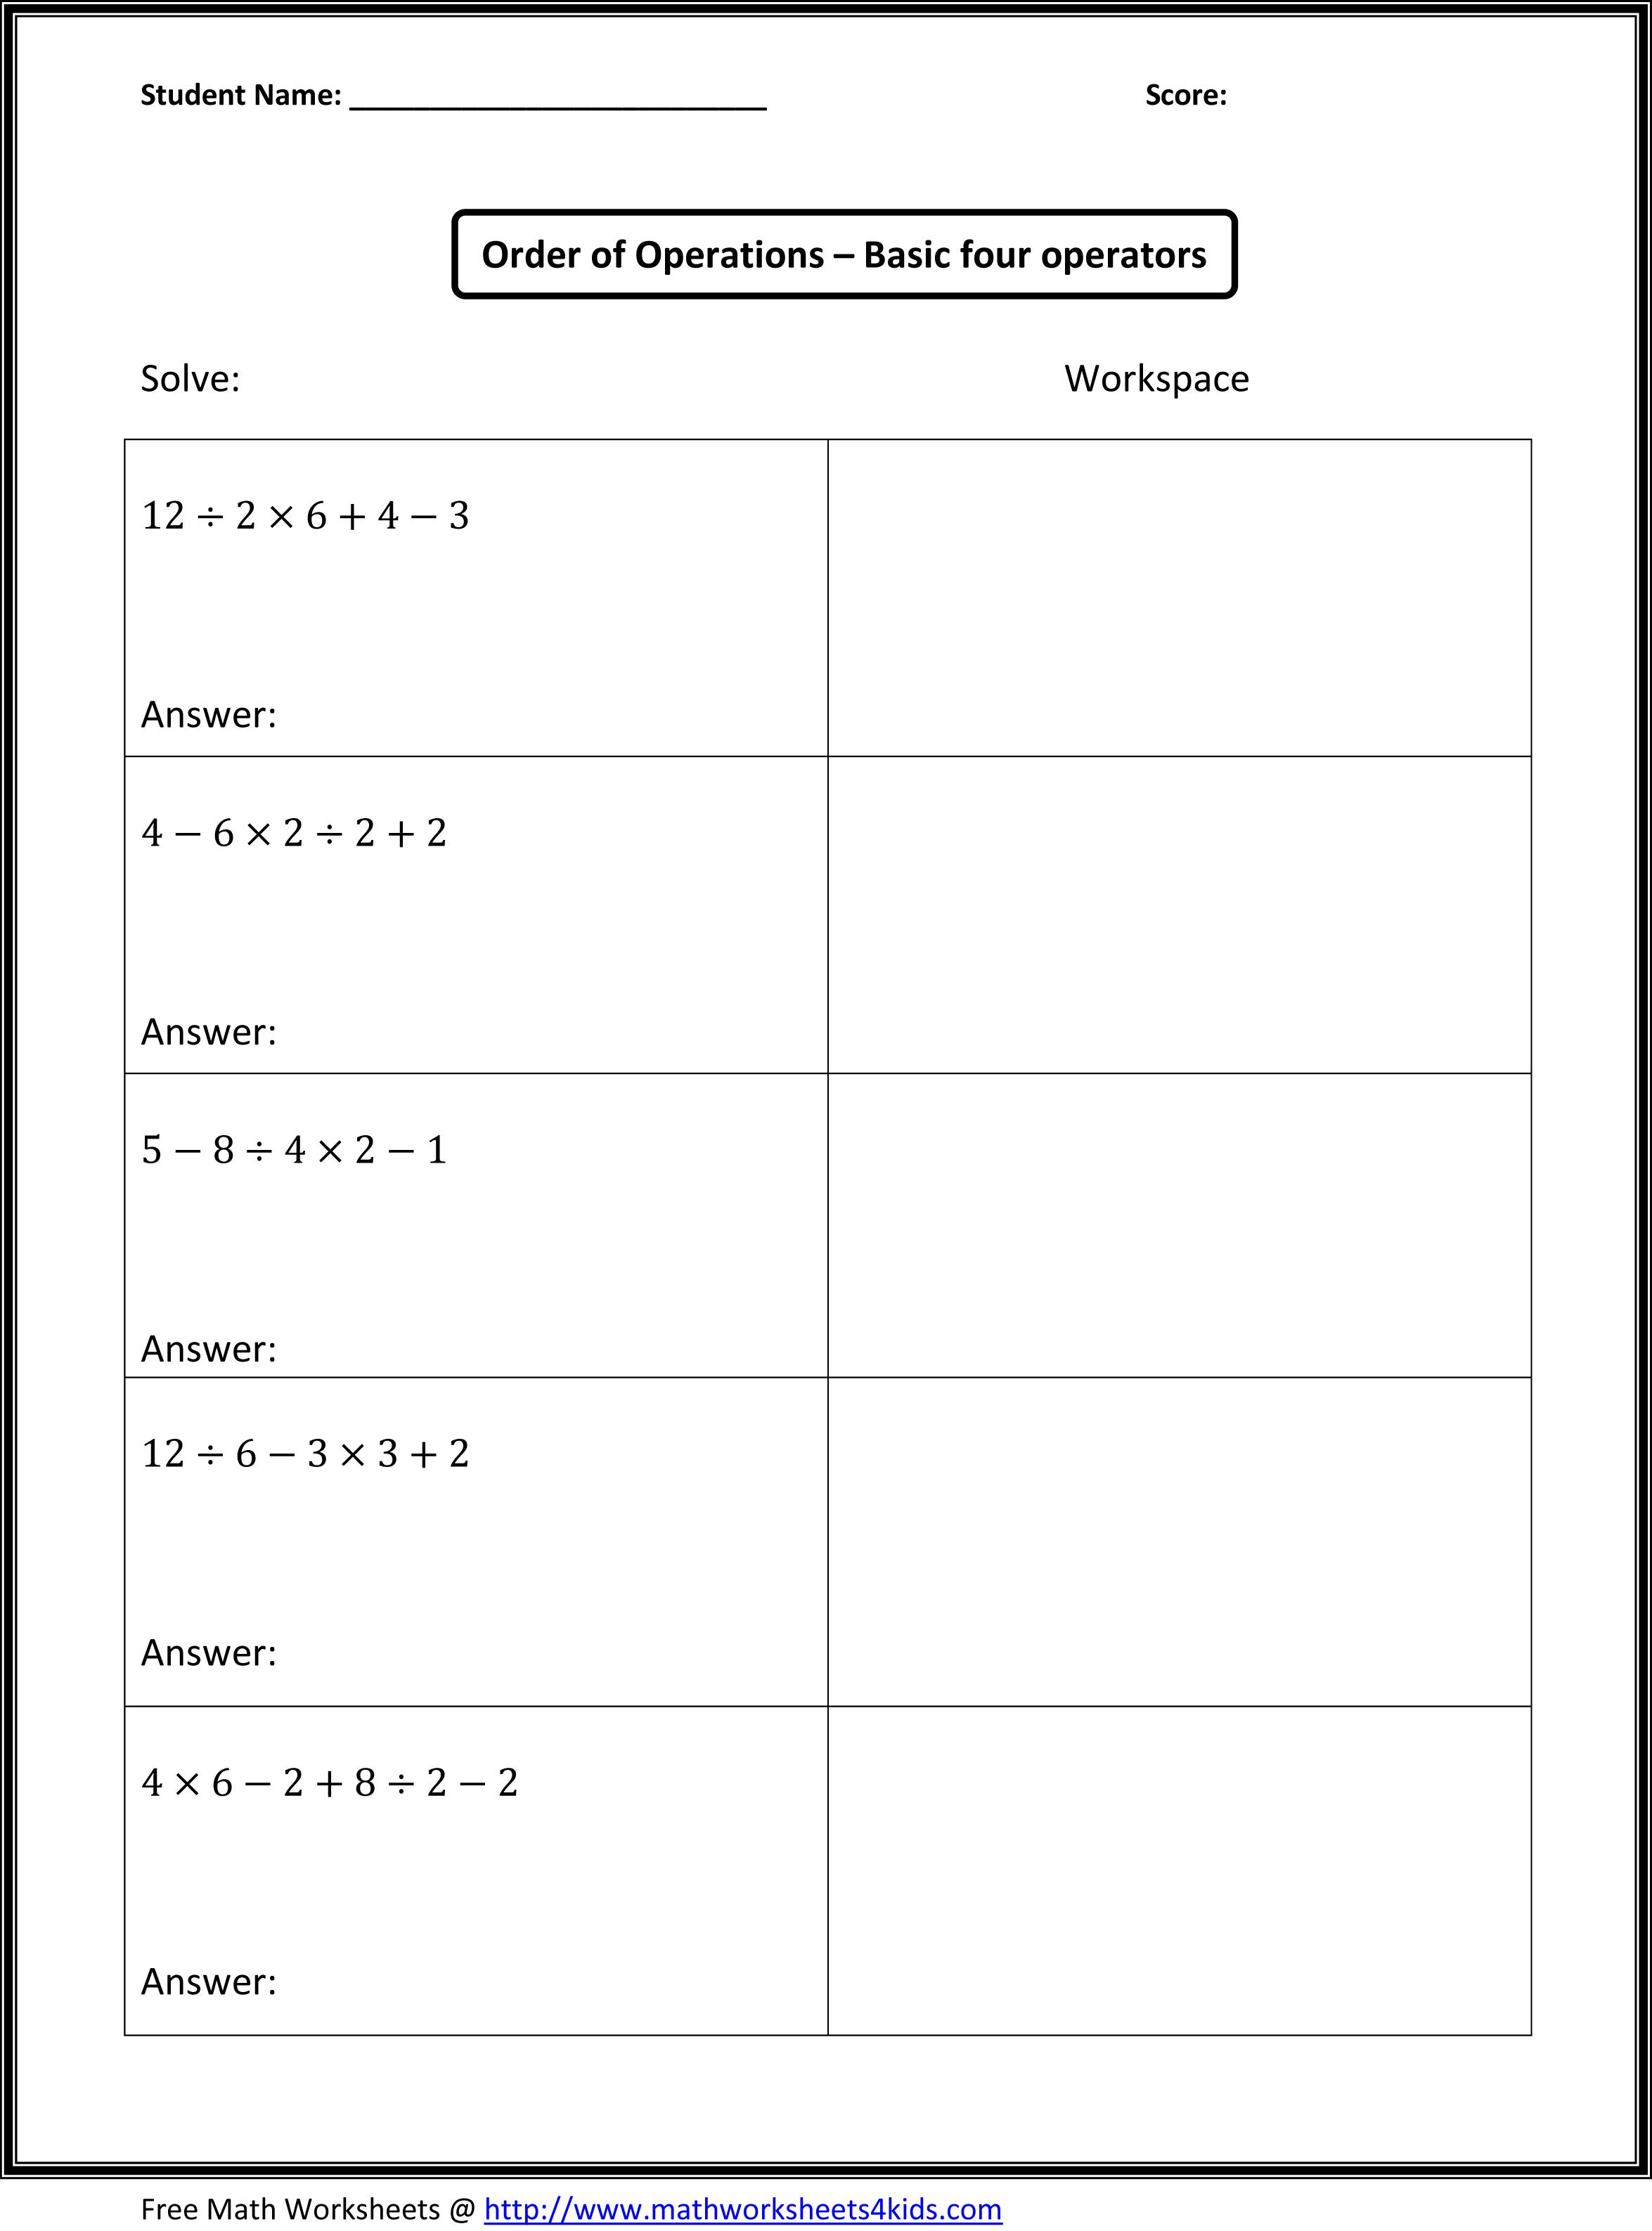 17 Best Images Of Pre Algebra Worksheets